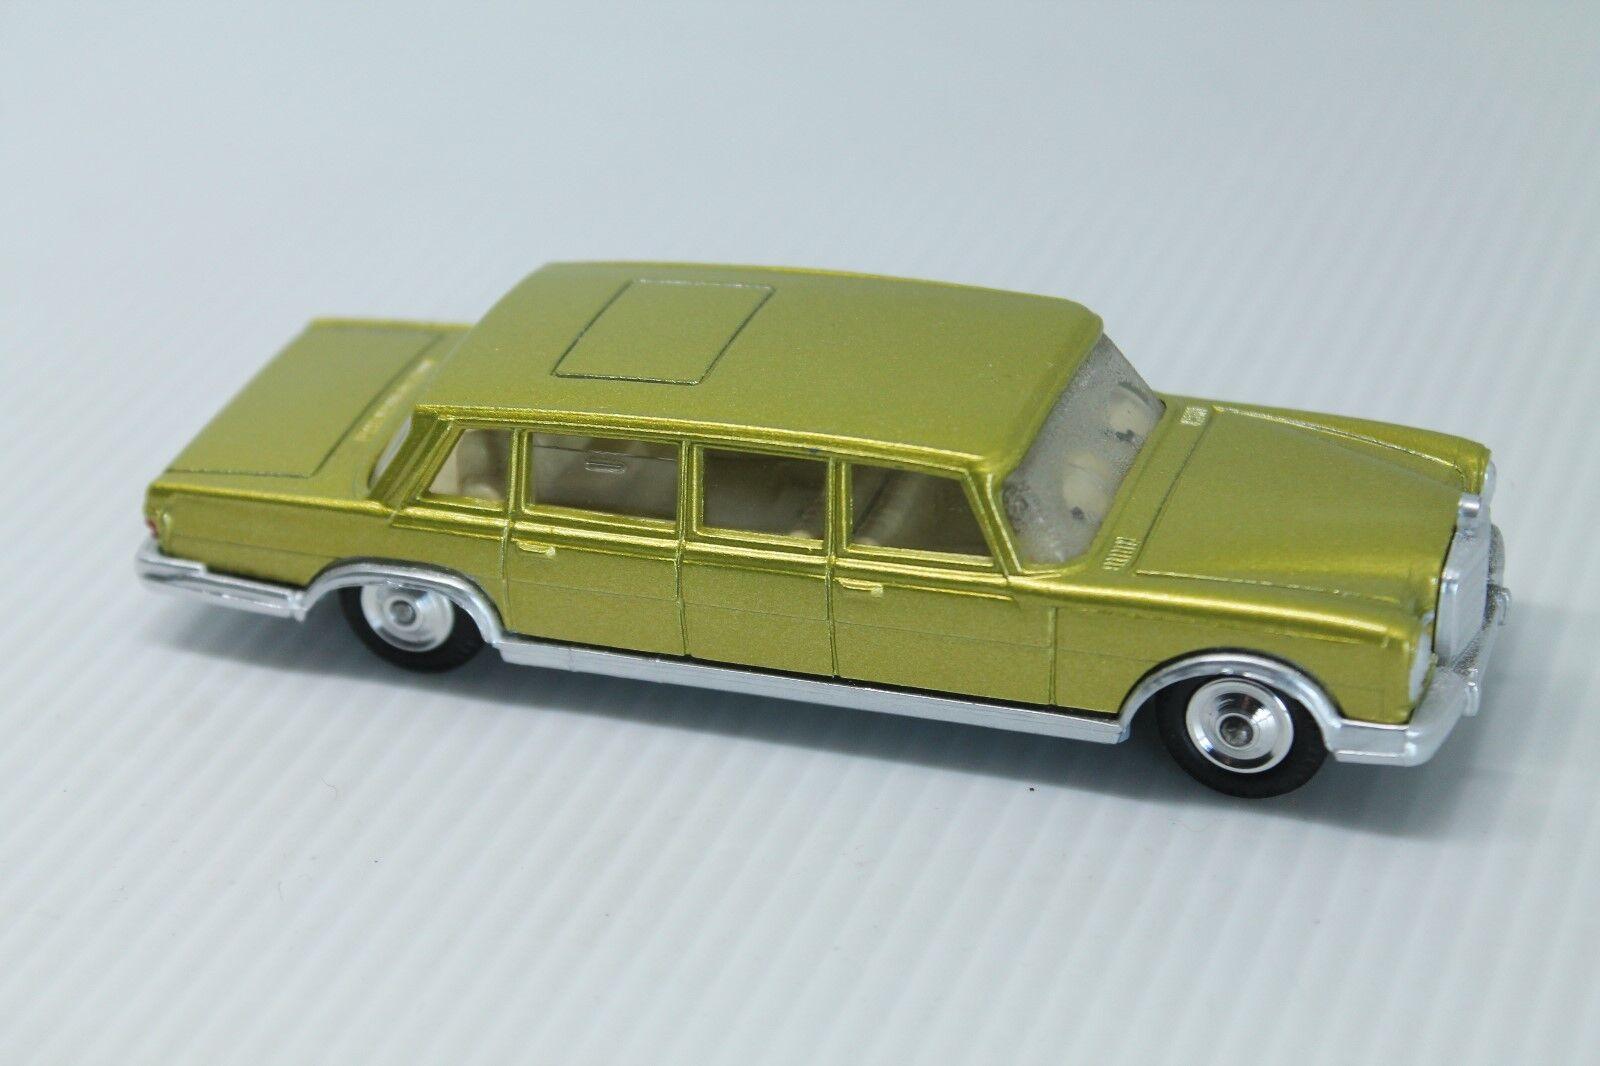 Corgi toys  Mercedes Benz MB 600  1 43  limpiaparabrisas